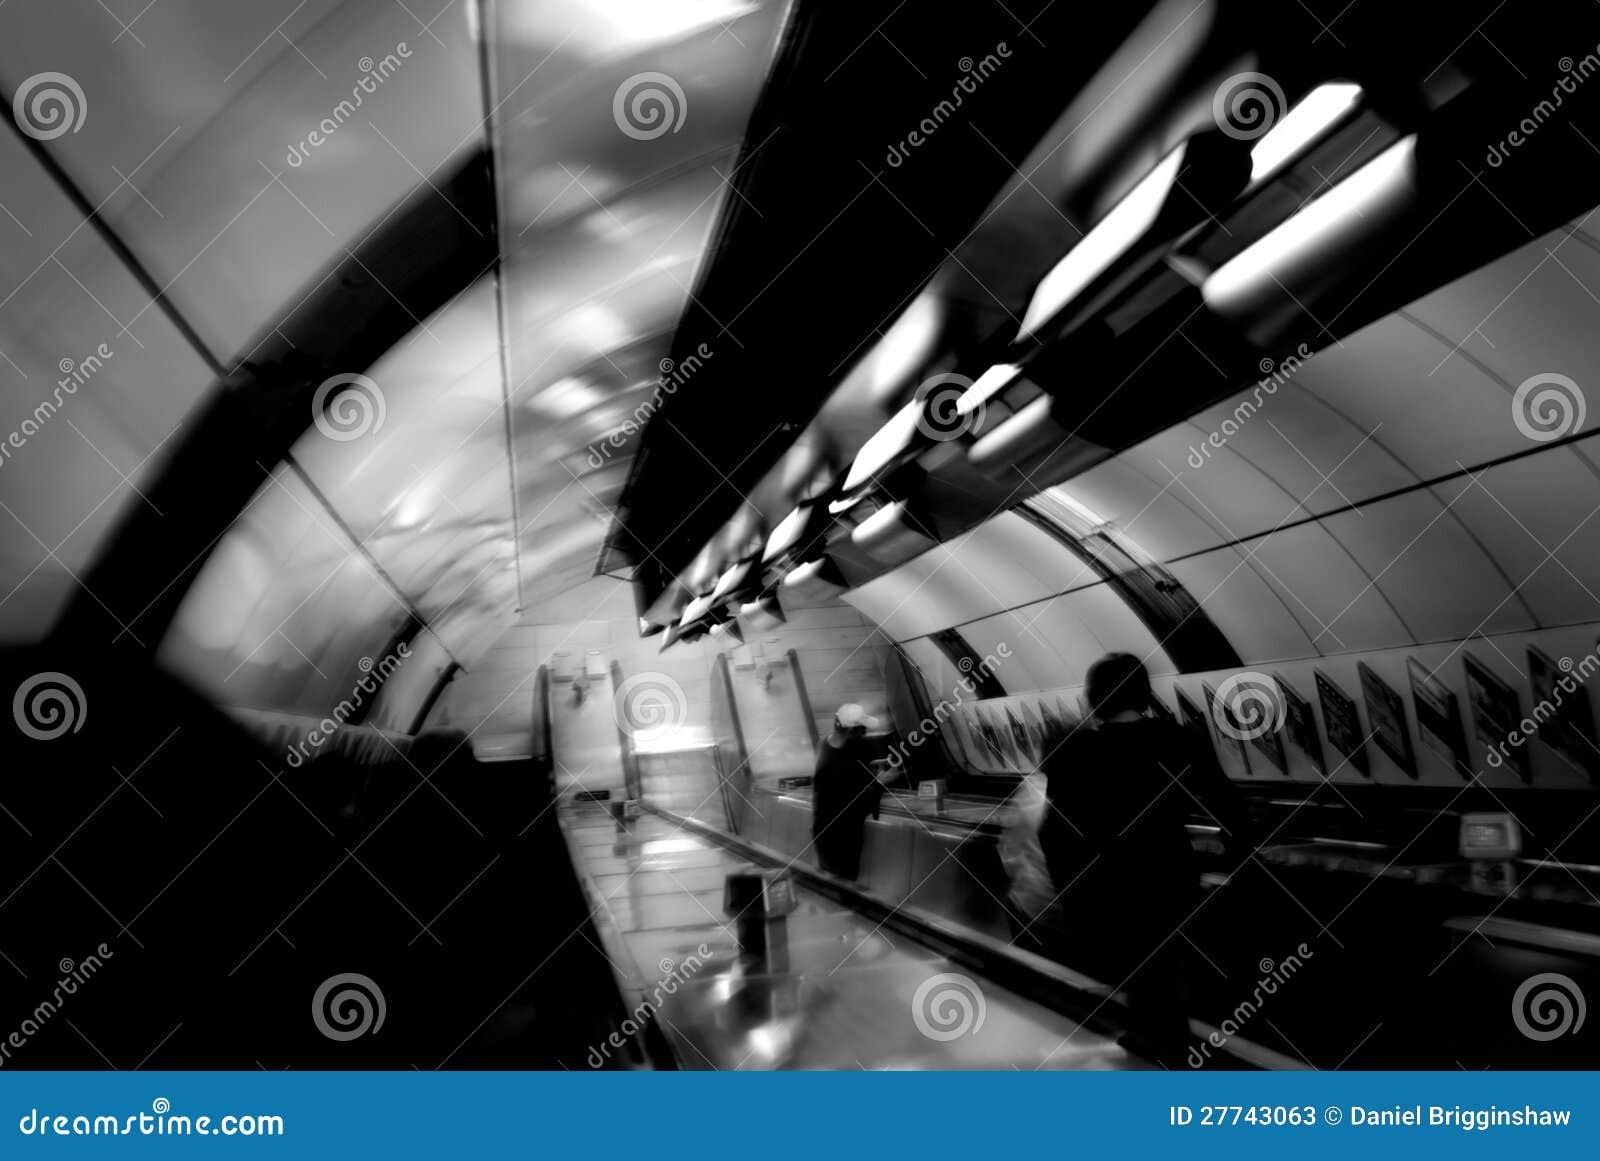 London Underground Snapshot